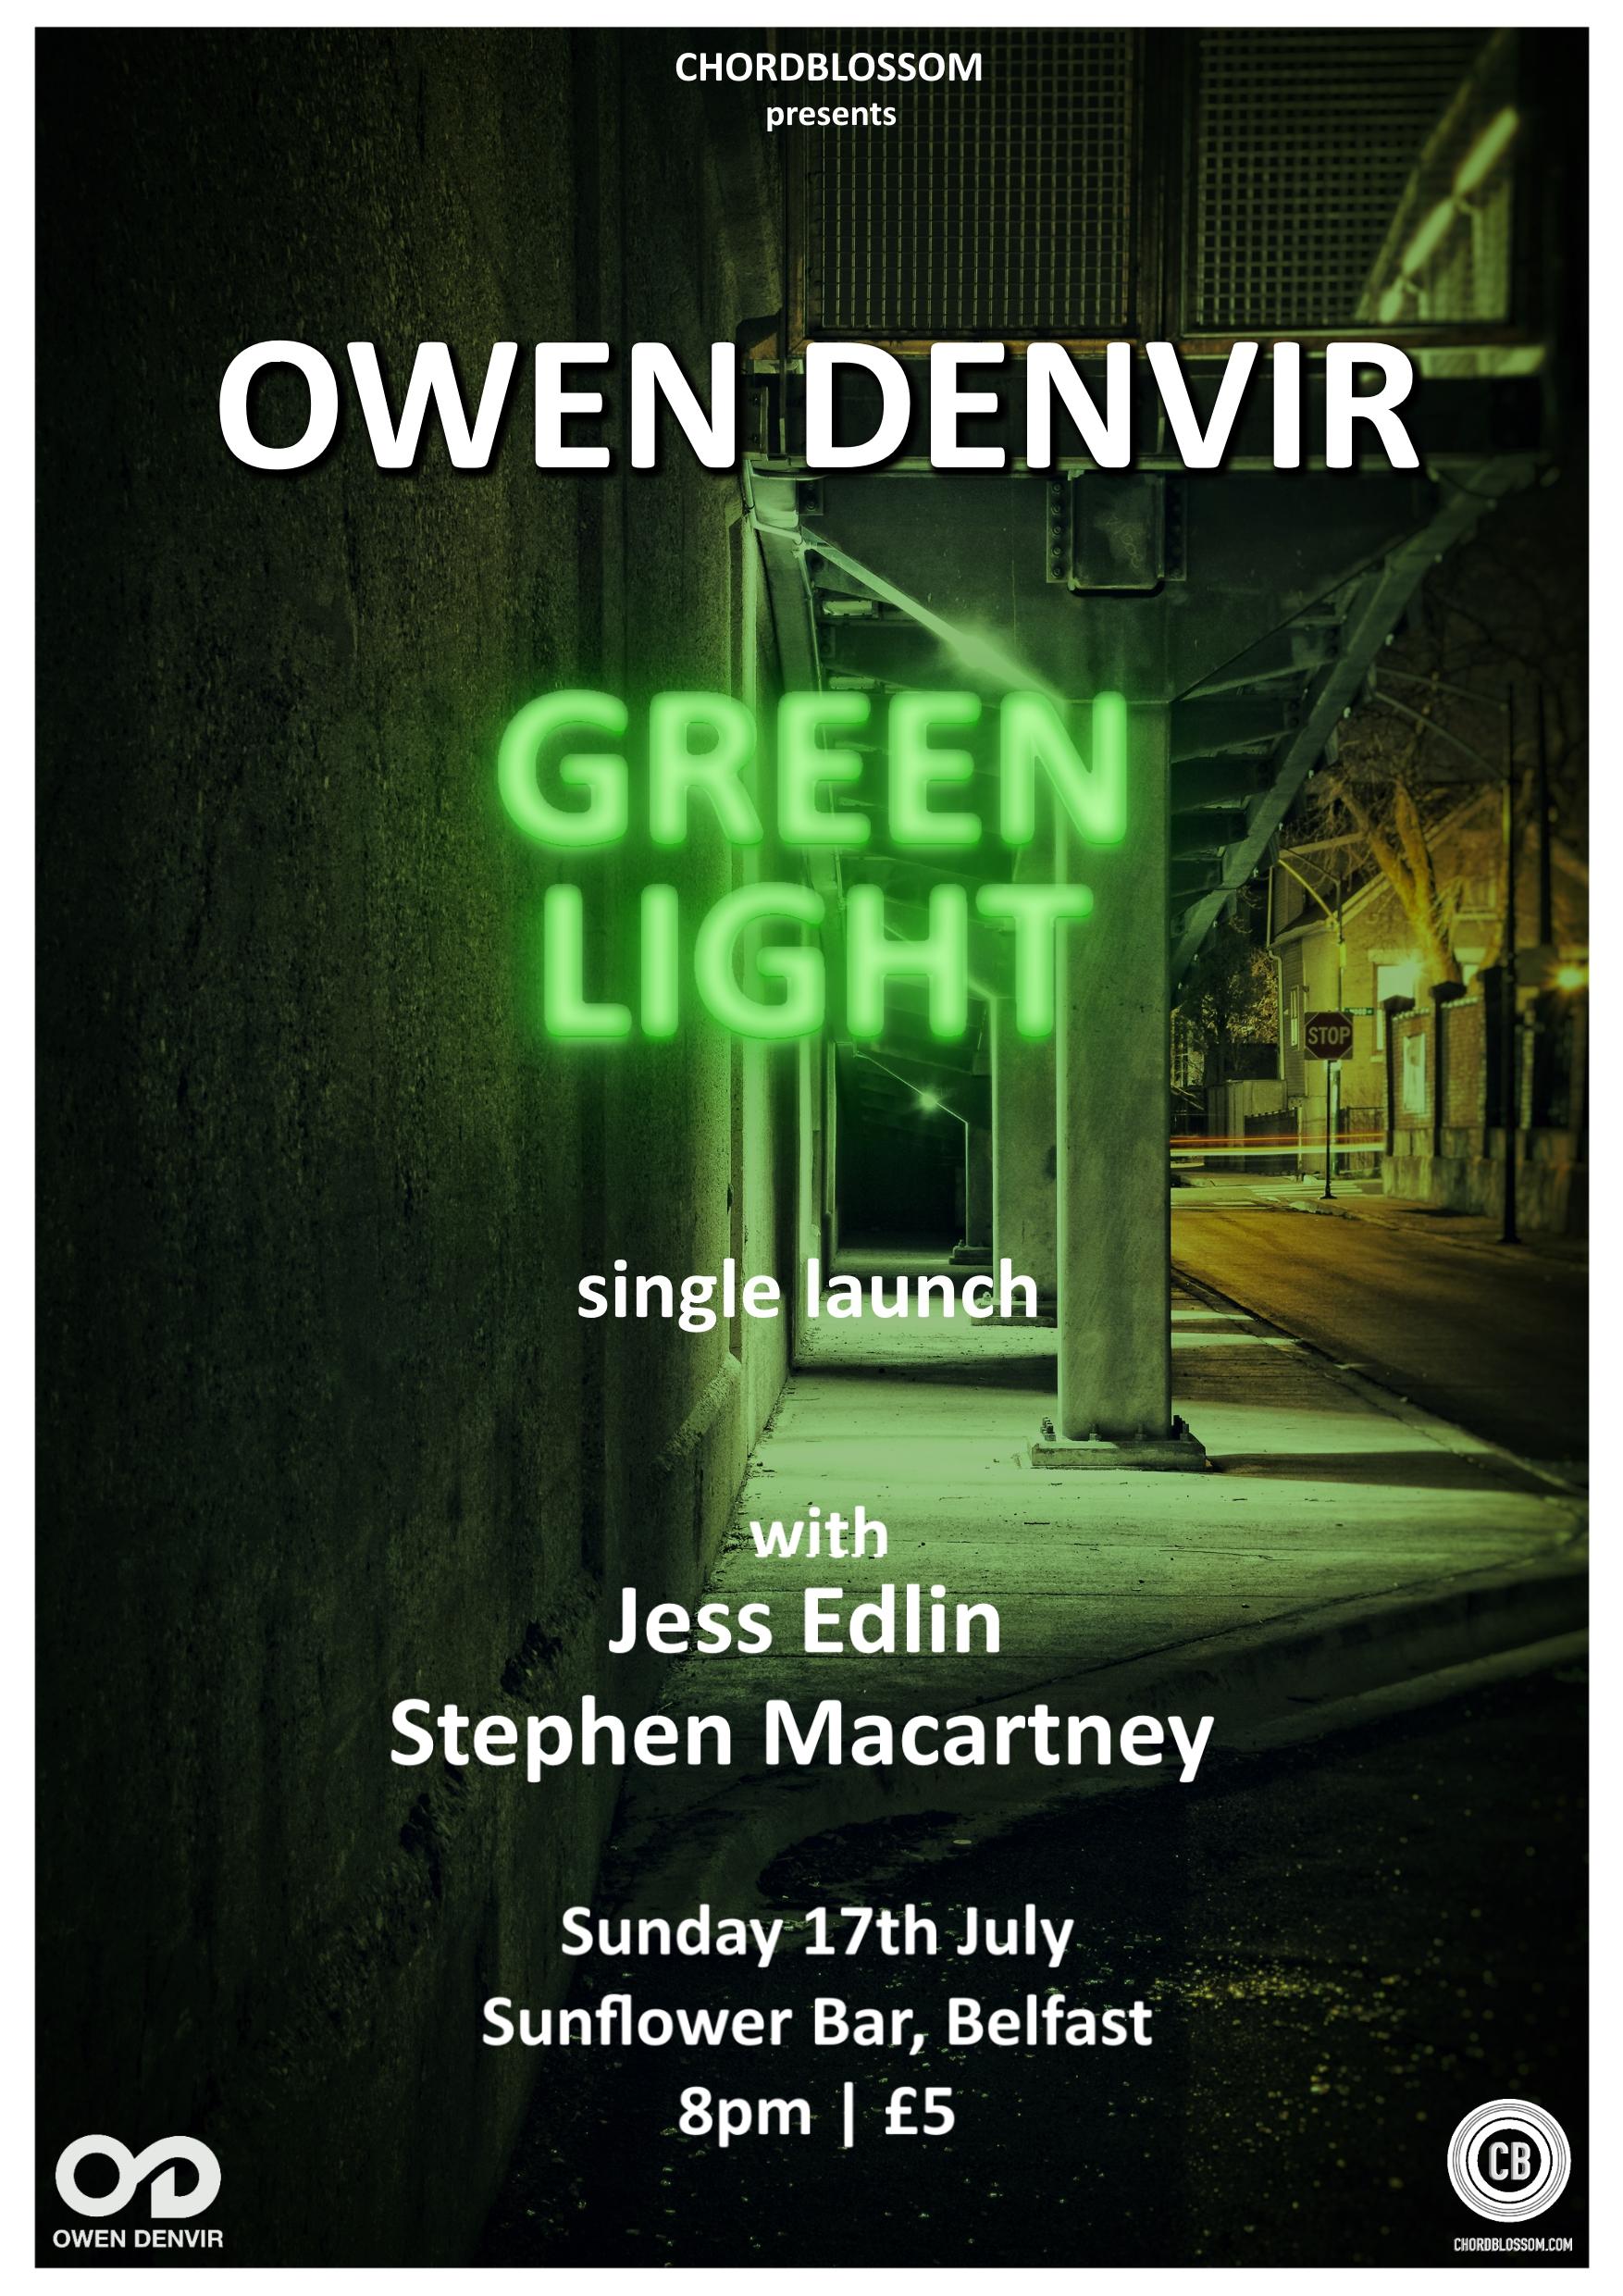 Chordblossom Presents: Owen Denvir 'Green Light Single Launch with Stephen Macartney & Jess Edlin